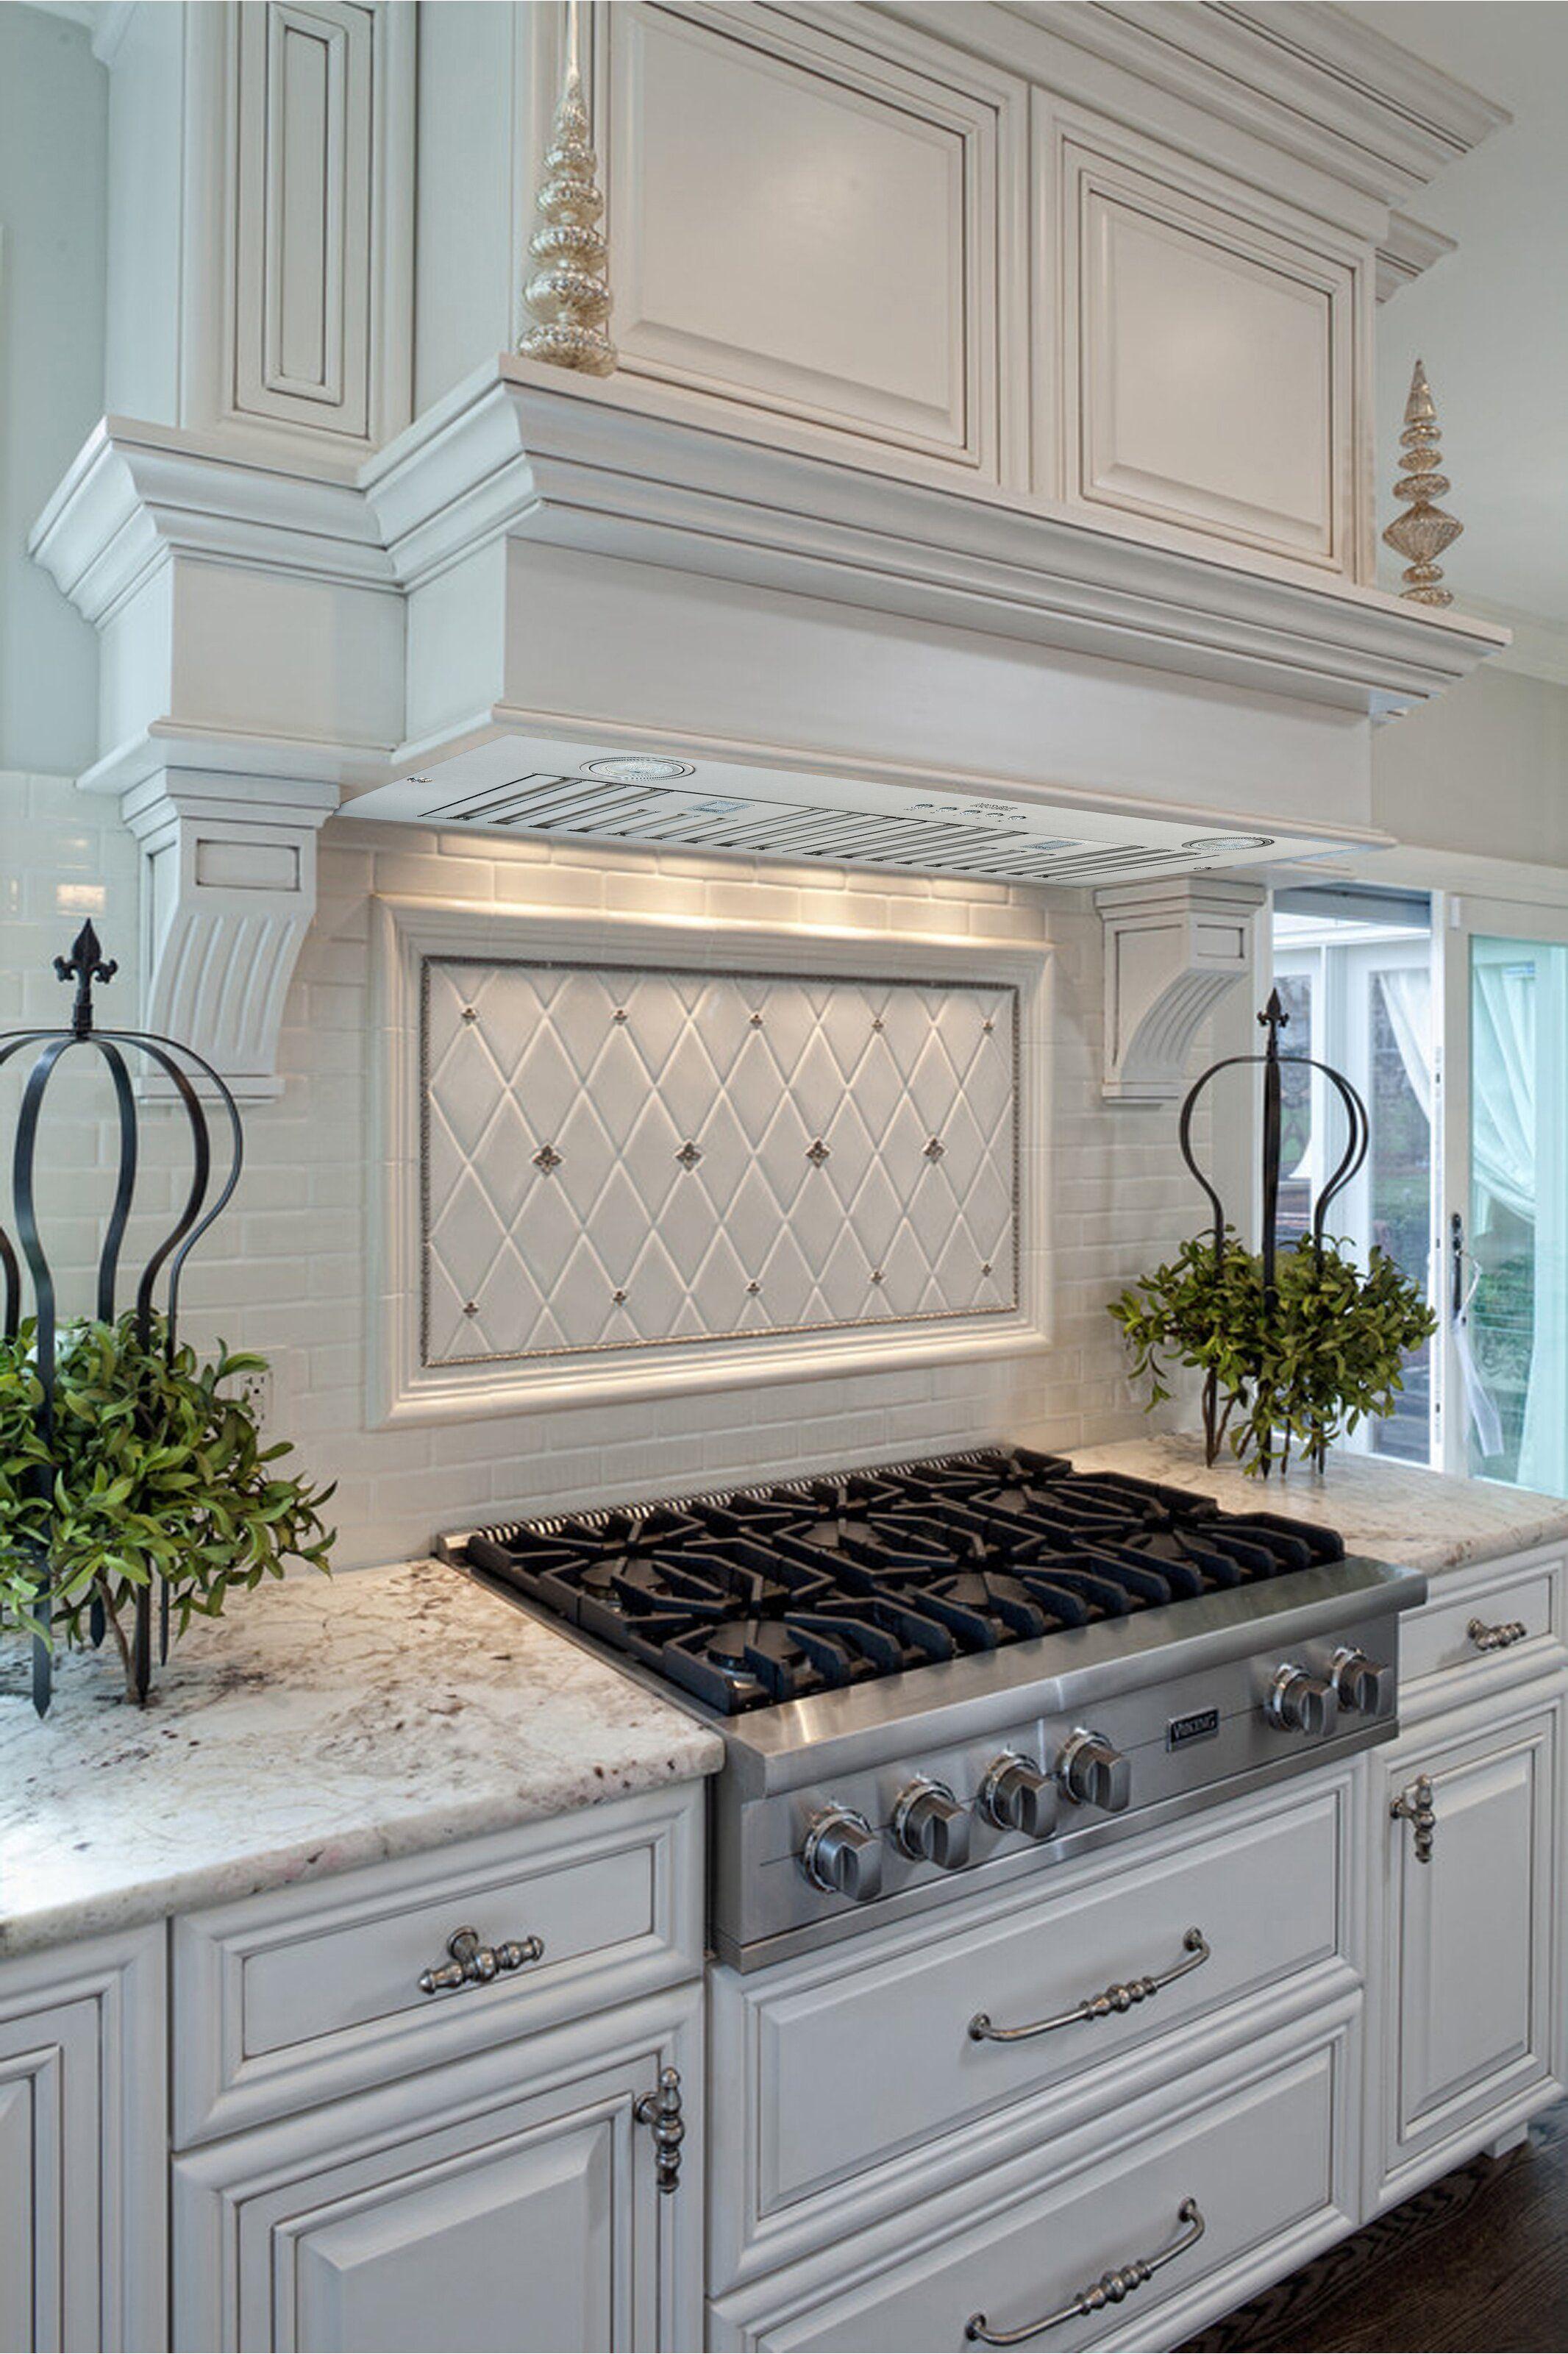 30 Brillia 550 Cfm Ducted Insert Range Hood In Stainless Steel In 2021 Kitchen Inspiration Design Stove Decor French Kitchen Design